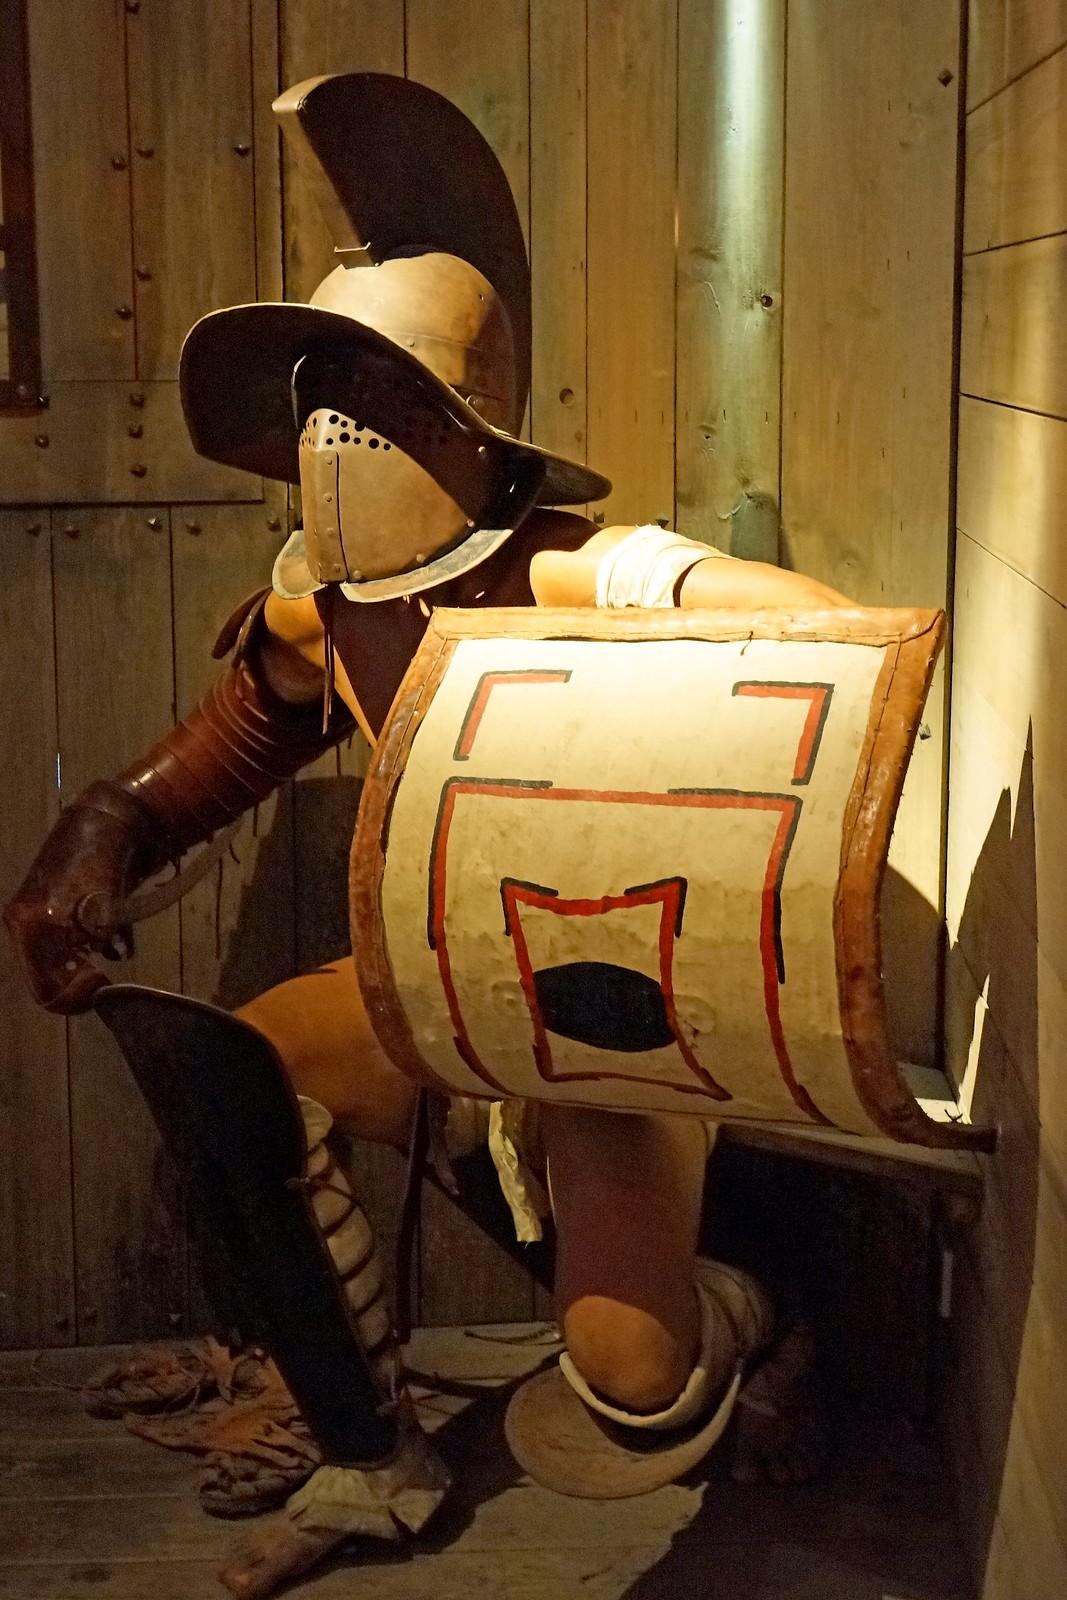 France-002338 - Gladiator